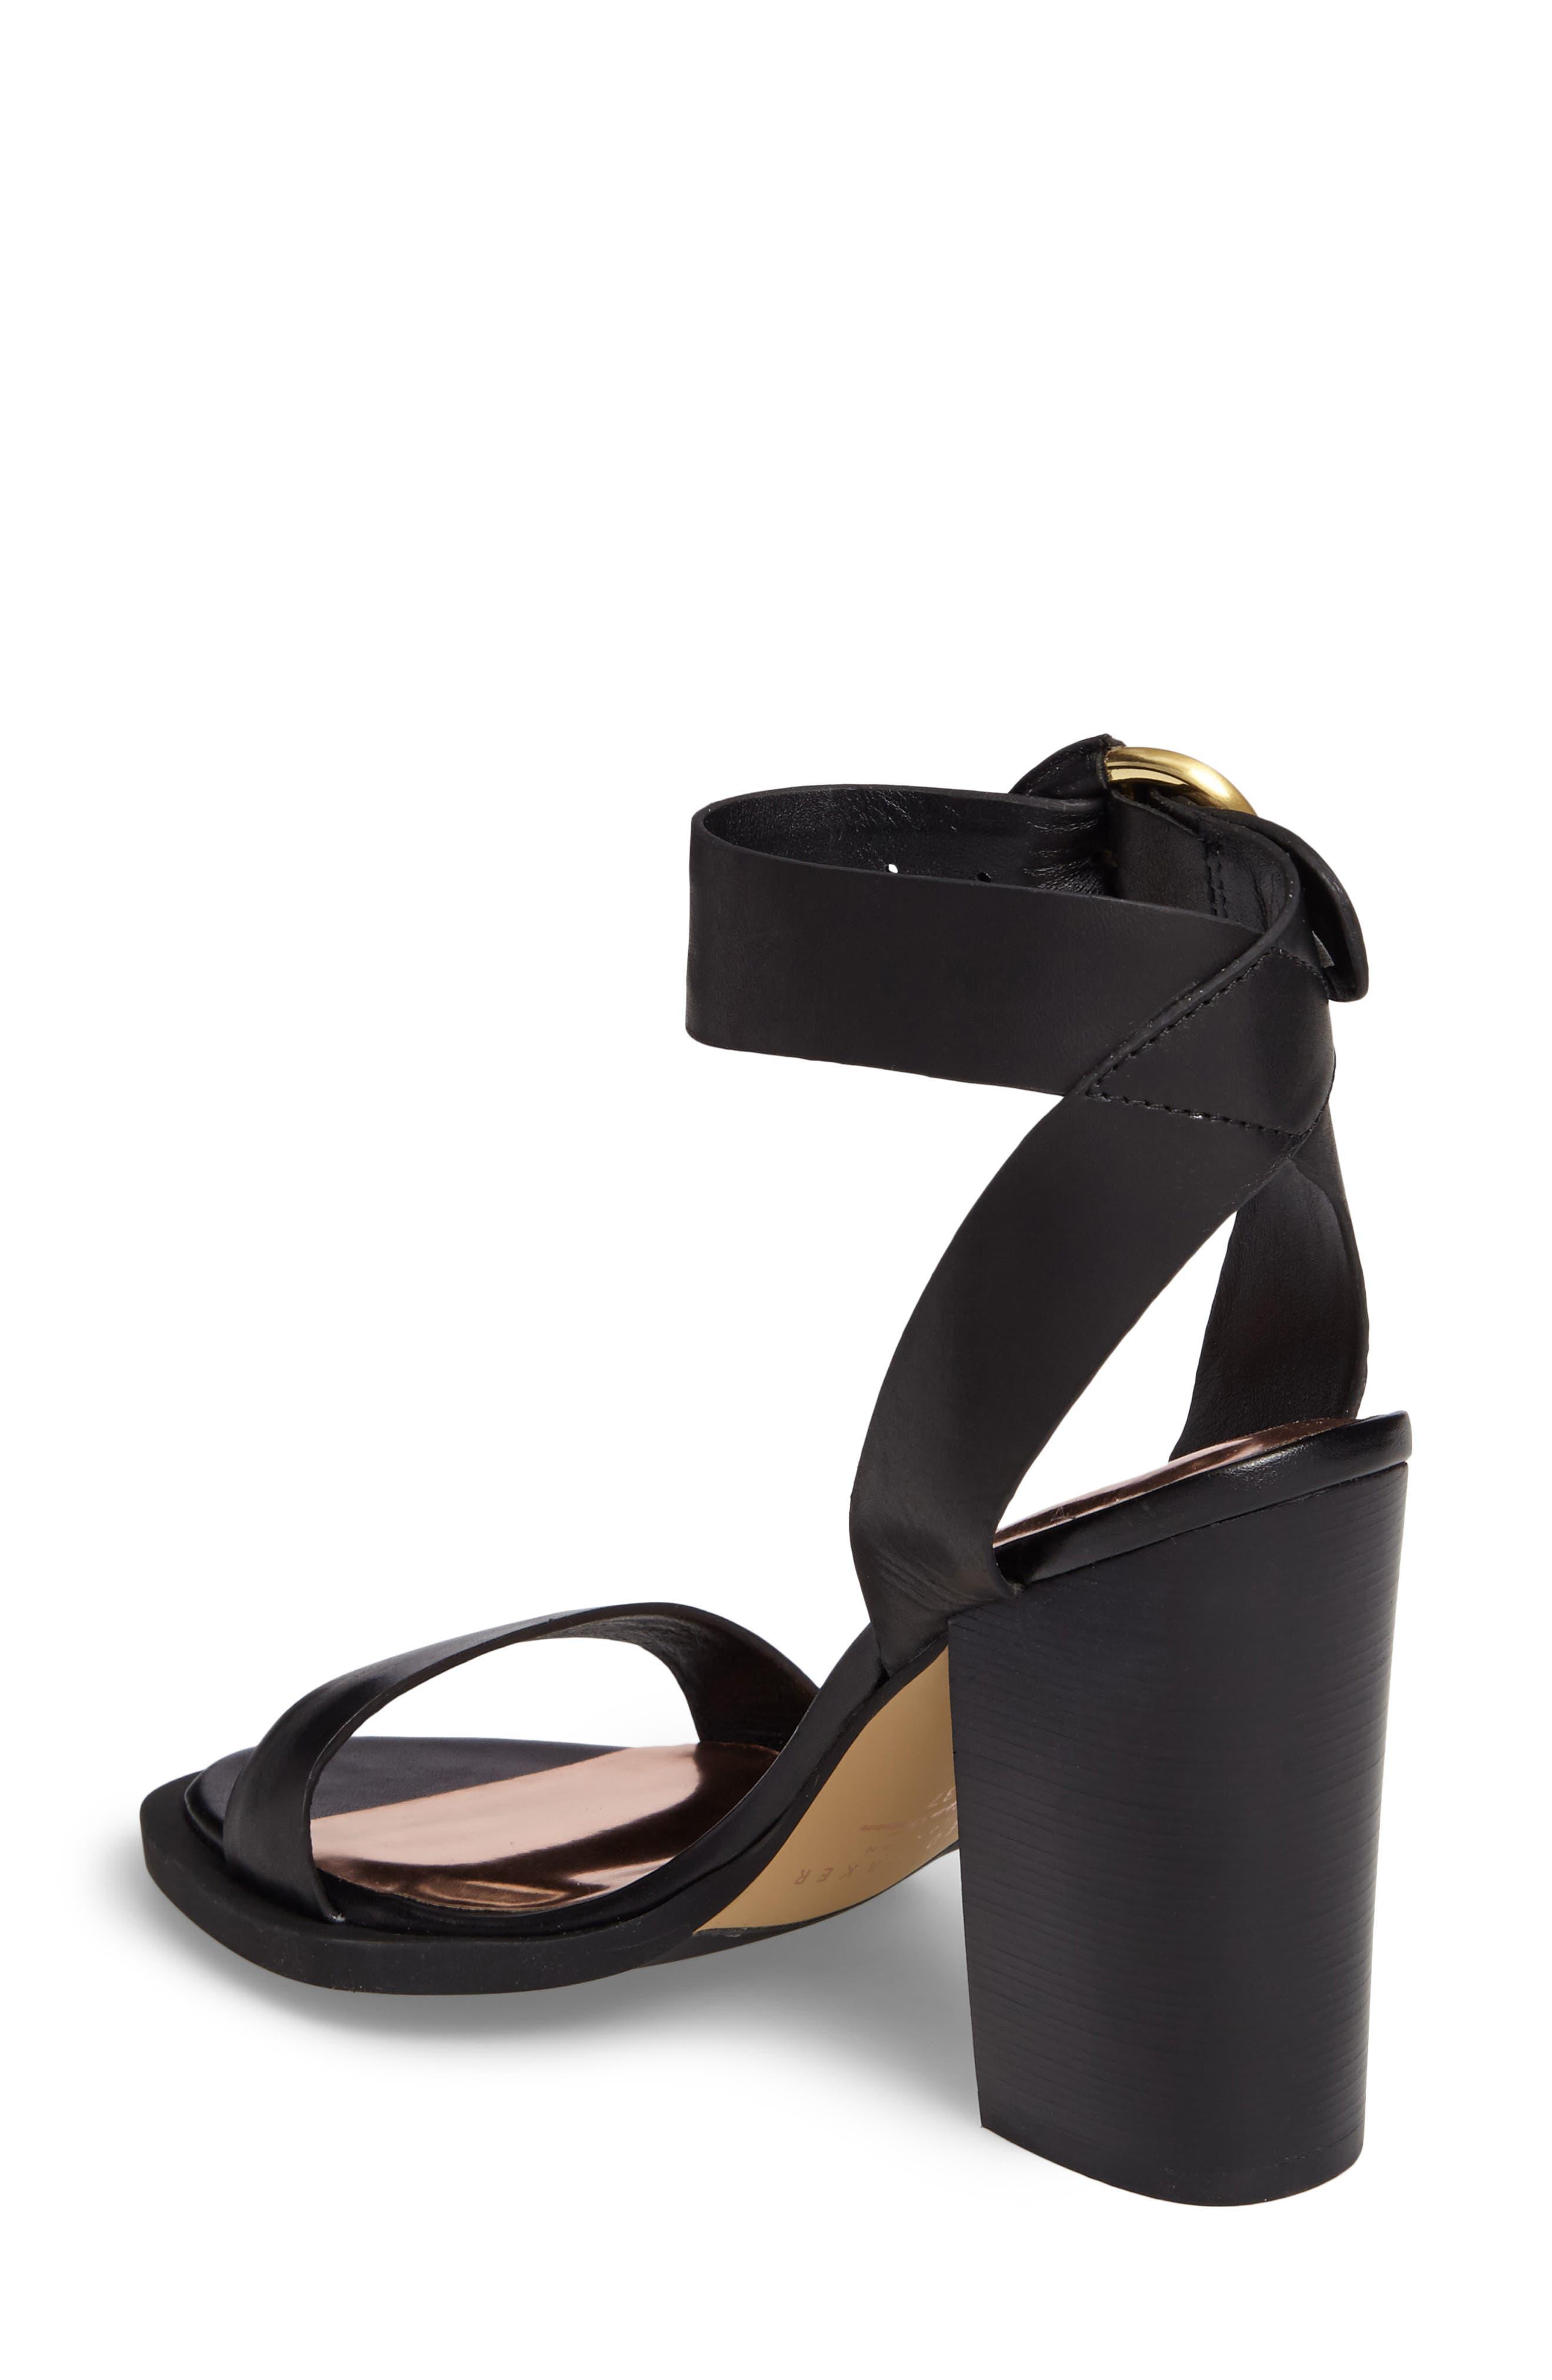 Betciy Ankle Strap Sandal,                             Alternate thumbnail 2, color,                             Black Leather